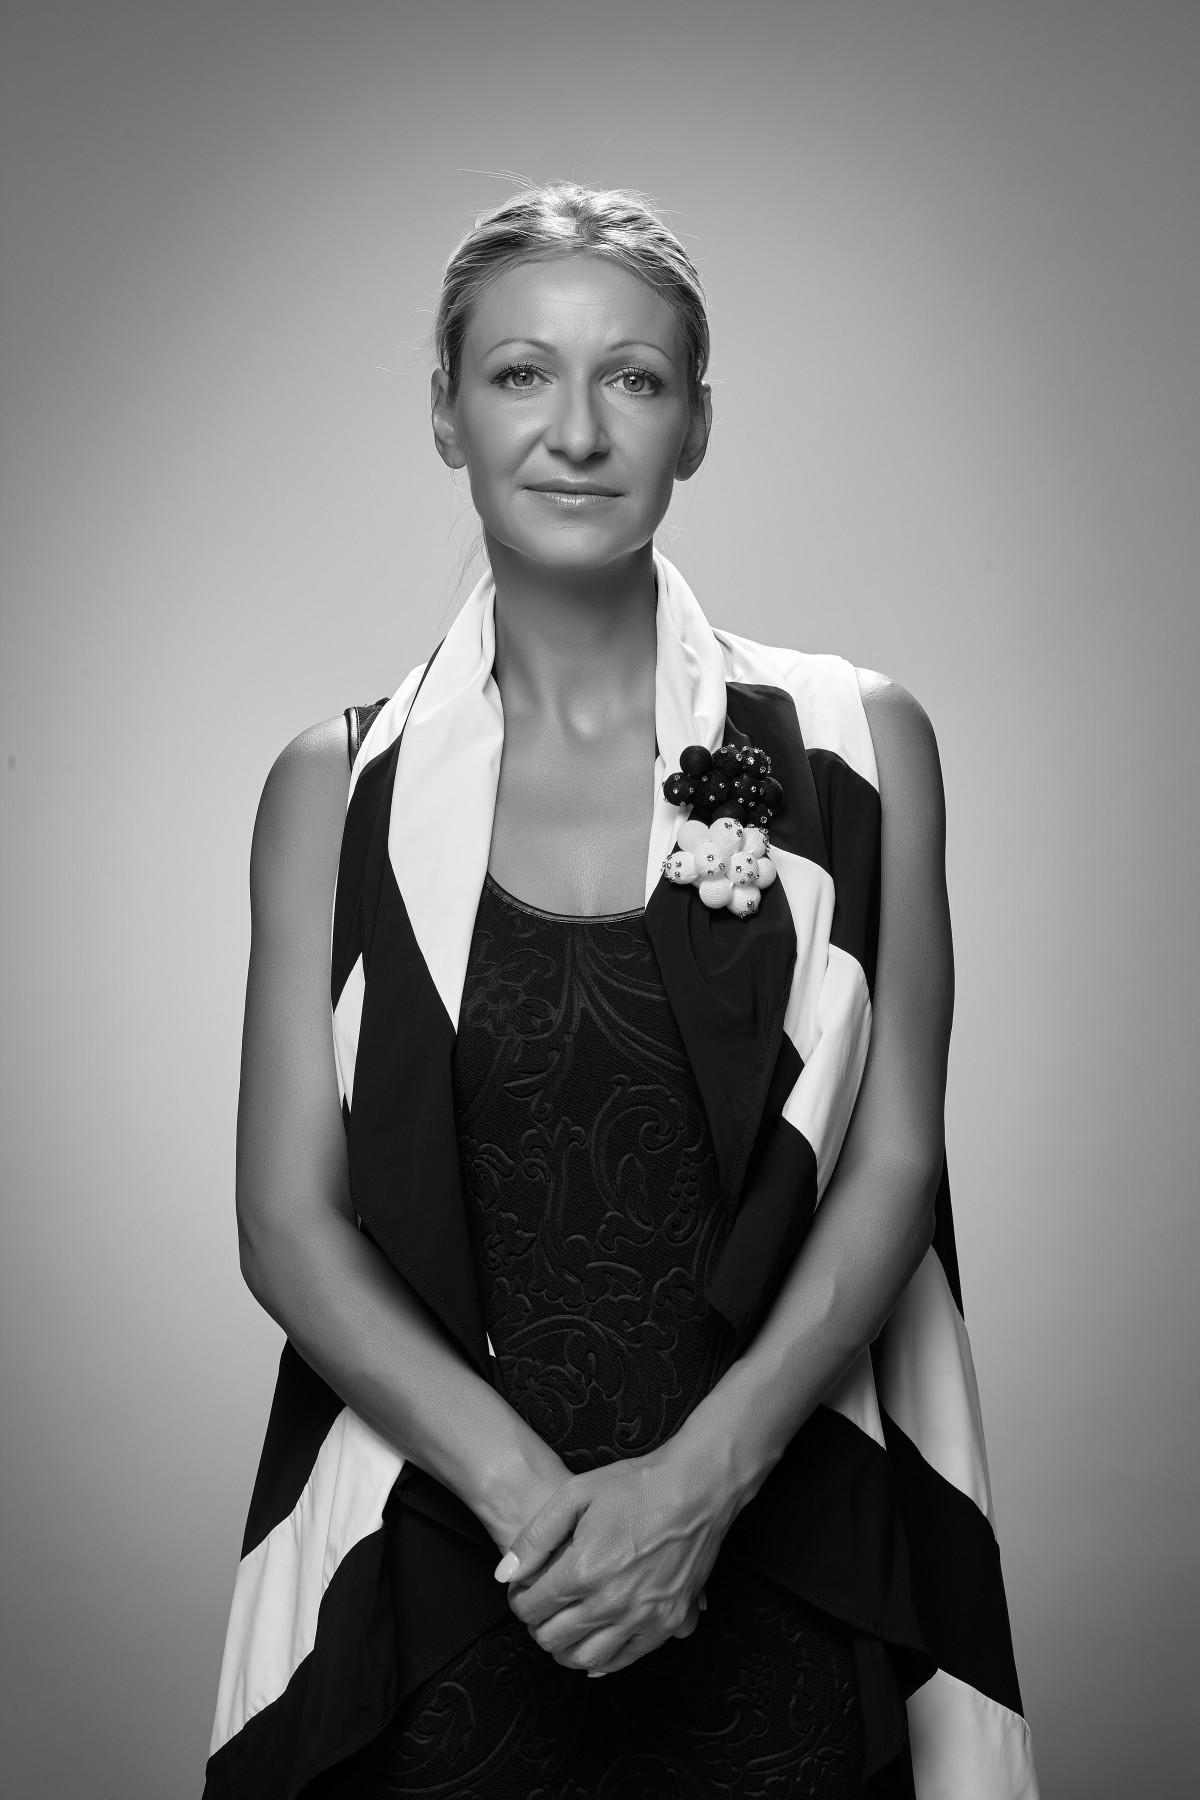 Agent of the week - Krasimira Nikolova